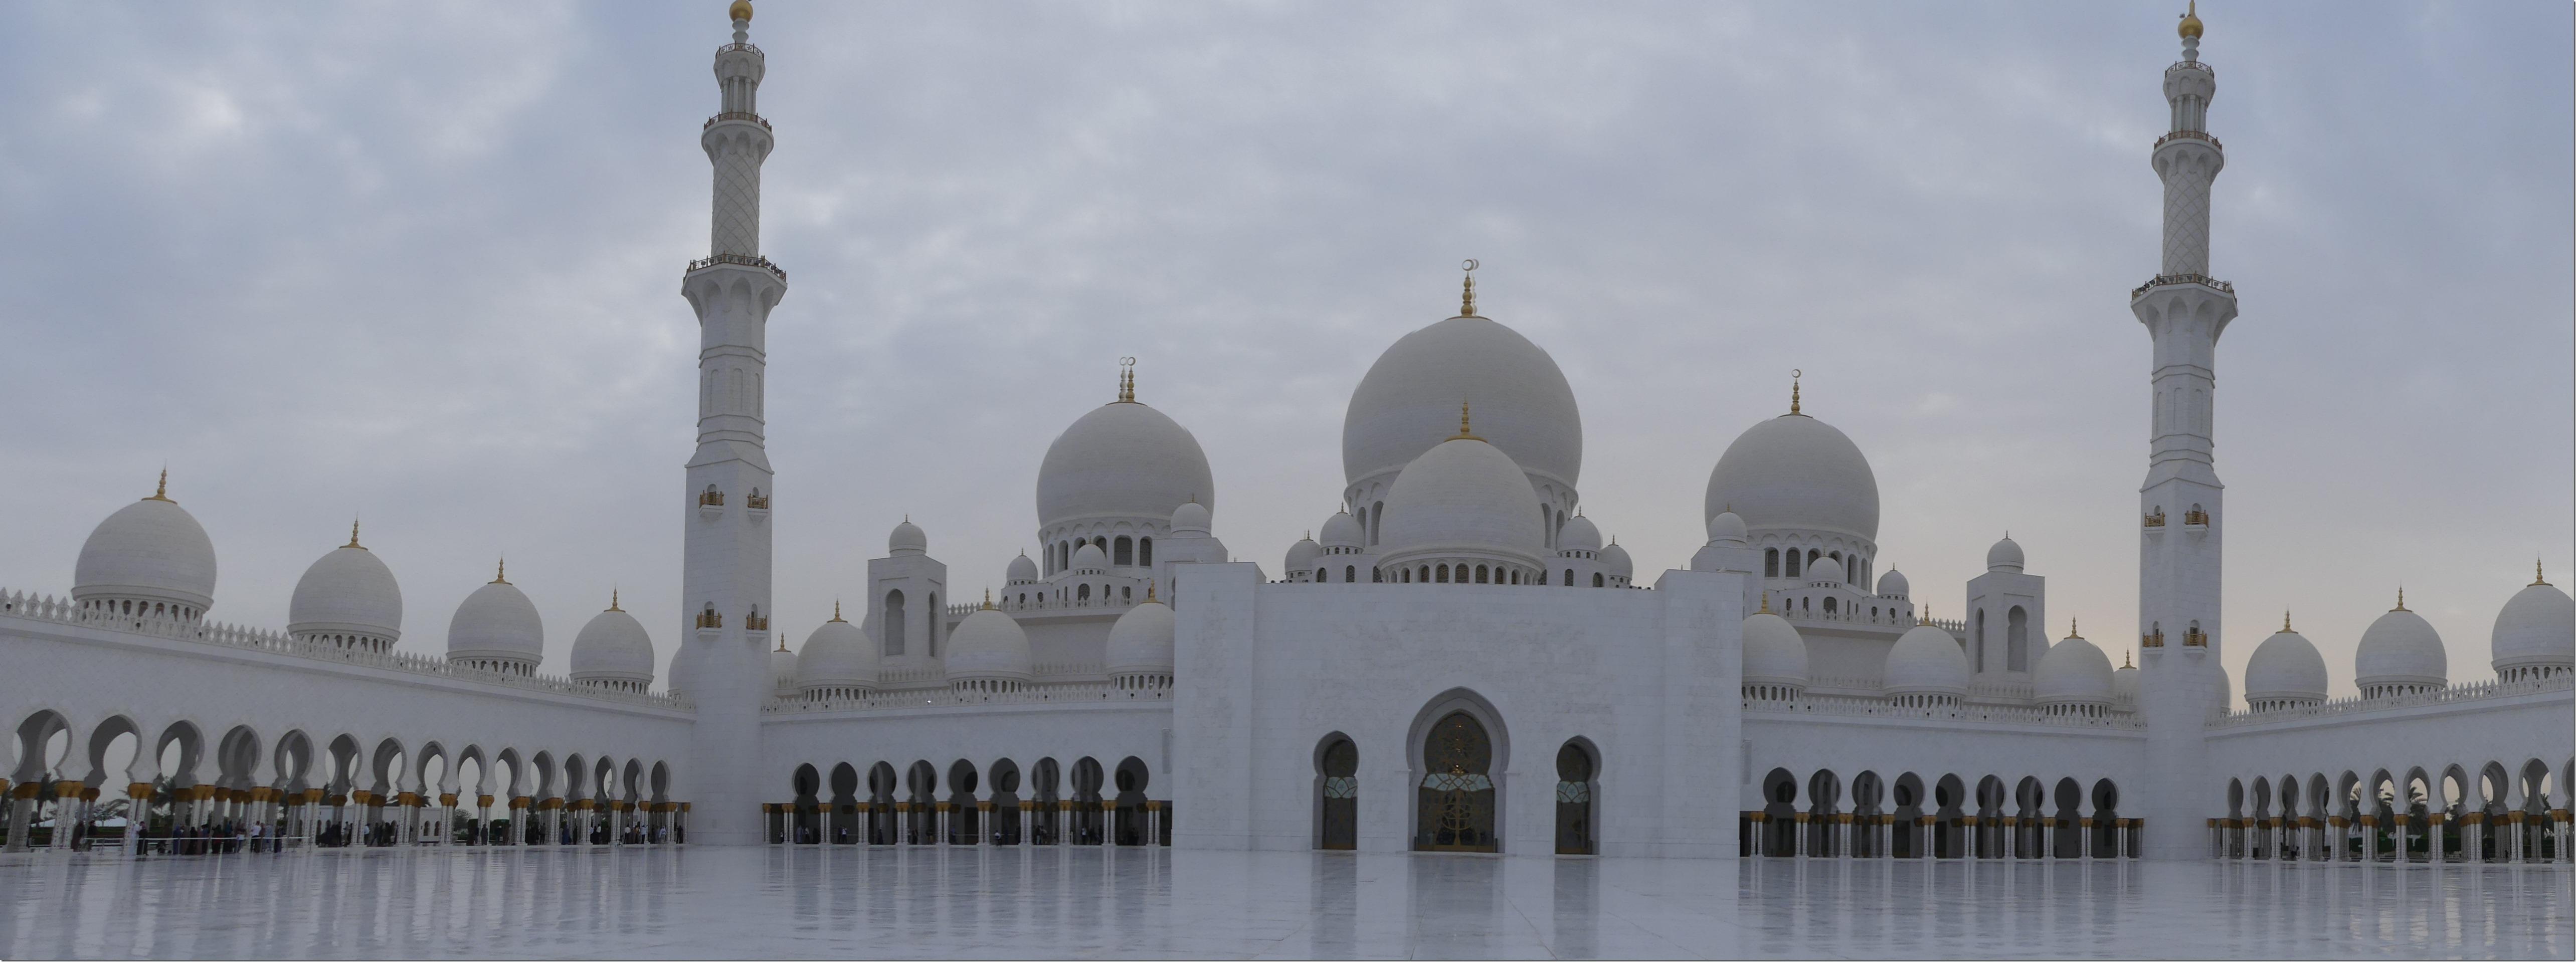 Abu Dhabi - Grande mosquée (25)